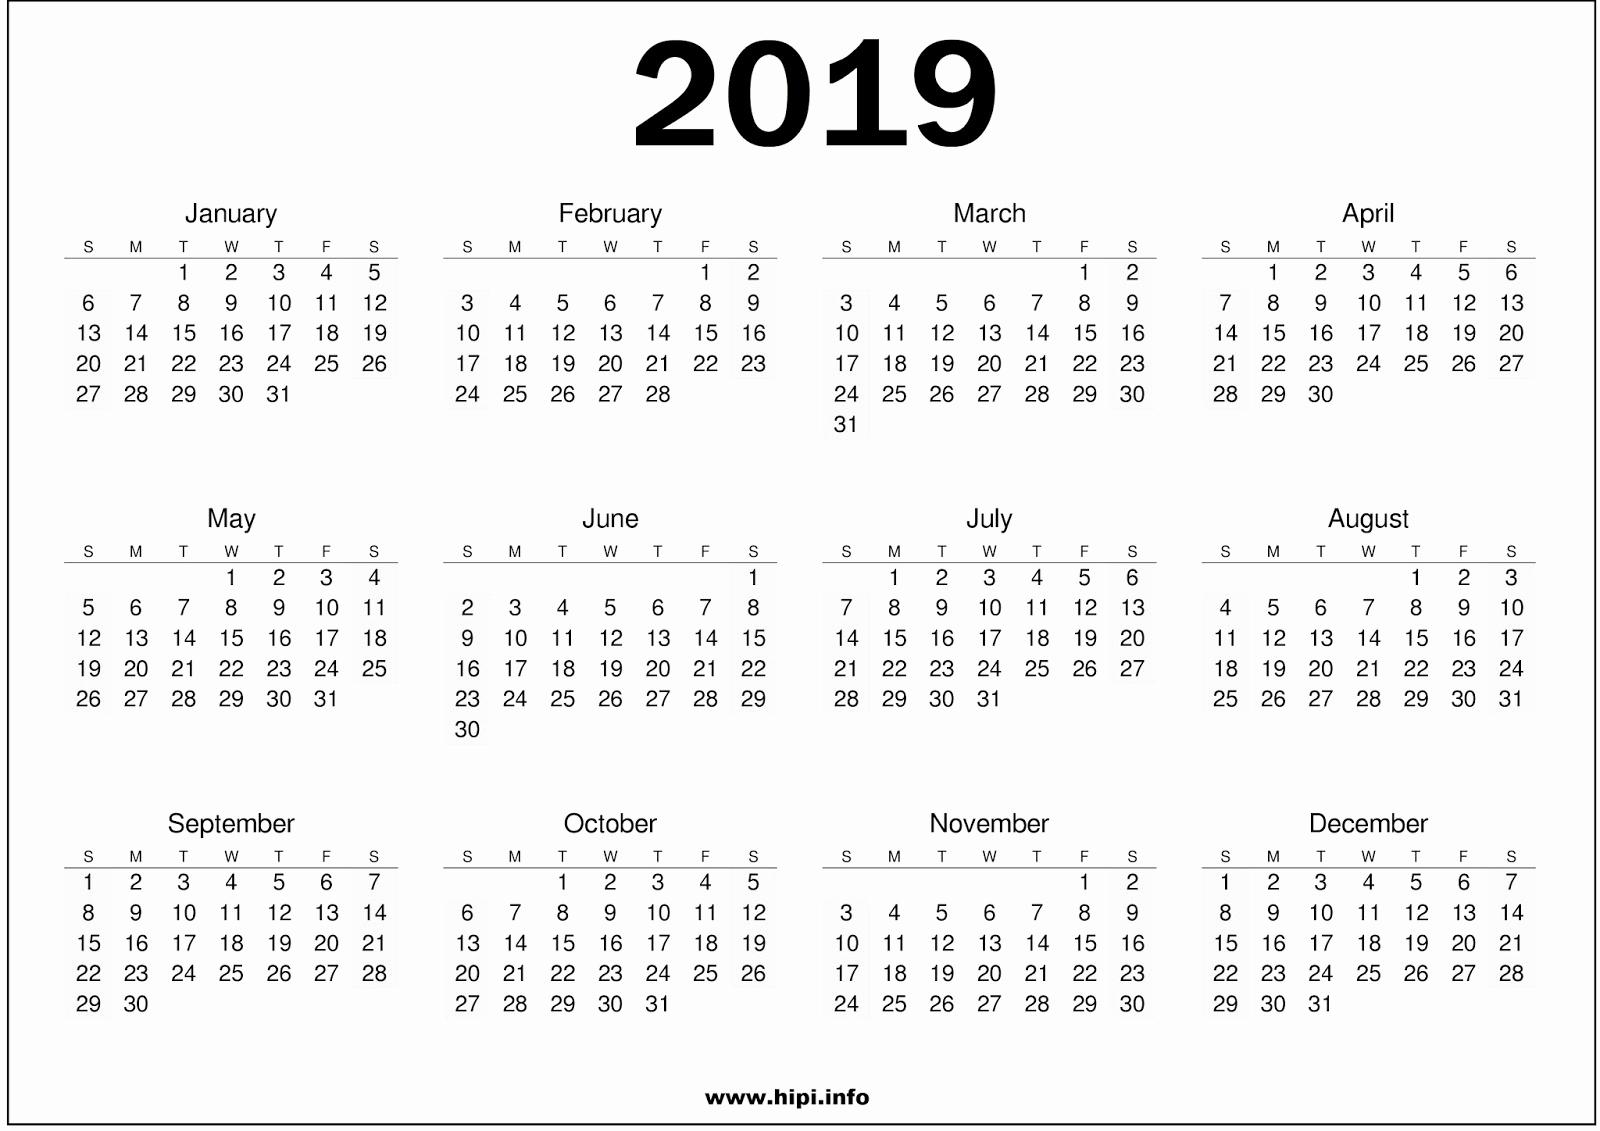 Free 2019 Calendar Template Elegant 2019 Calendar Printable Free007 Addicted2adventure